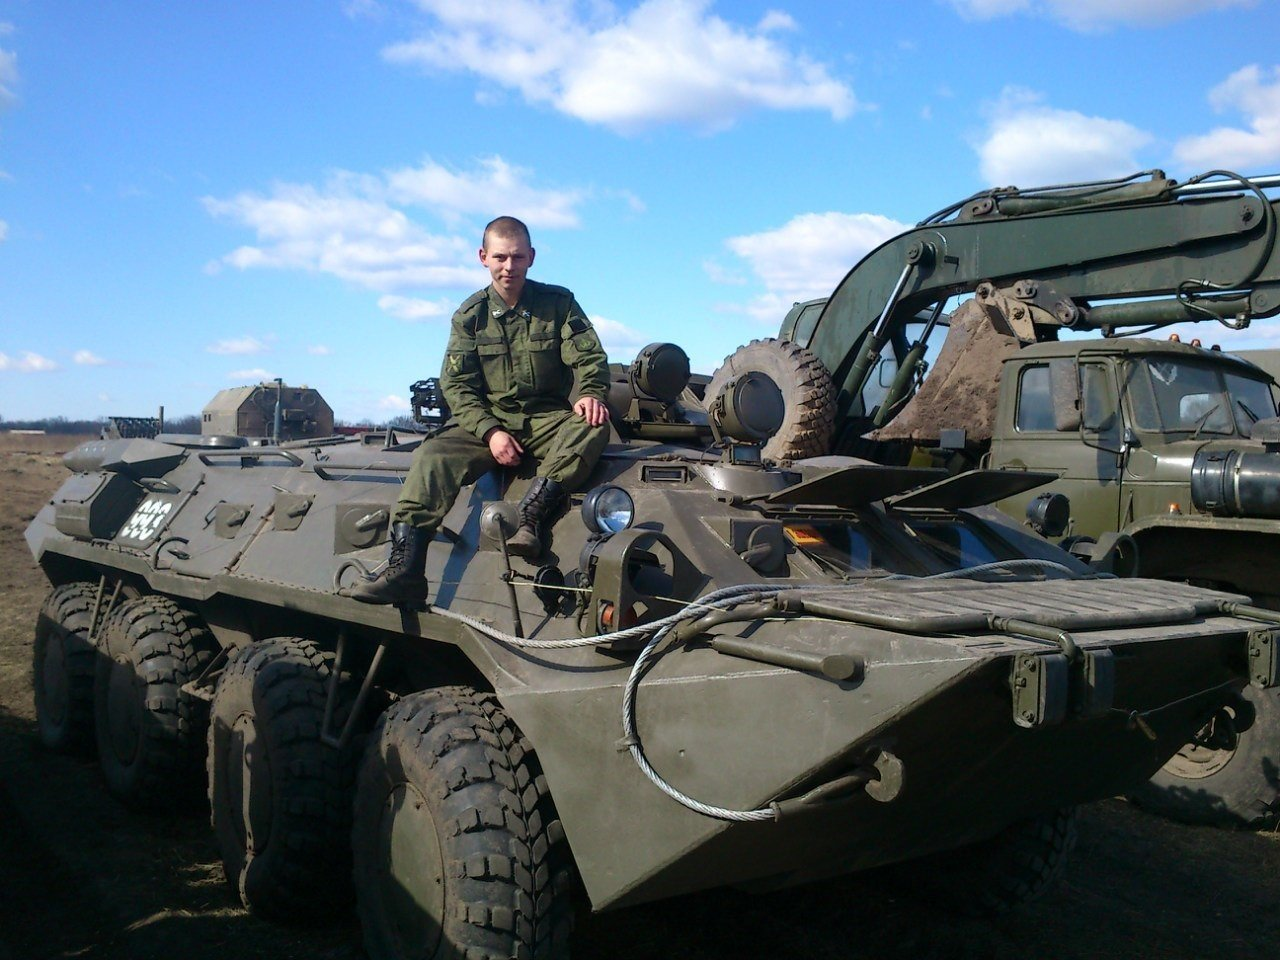 BT80 at the 53rd Anti-Aircraft Missile Brigade.